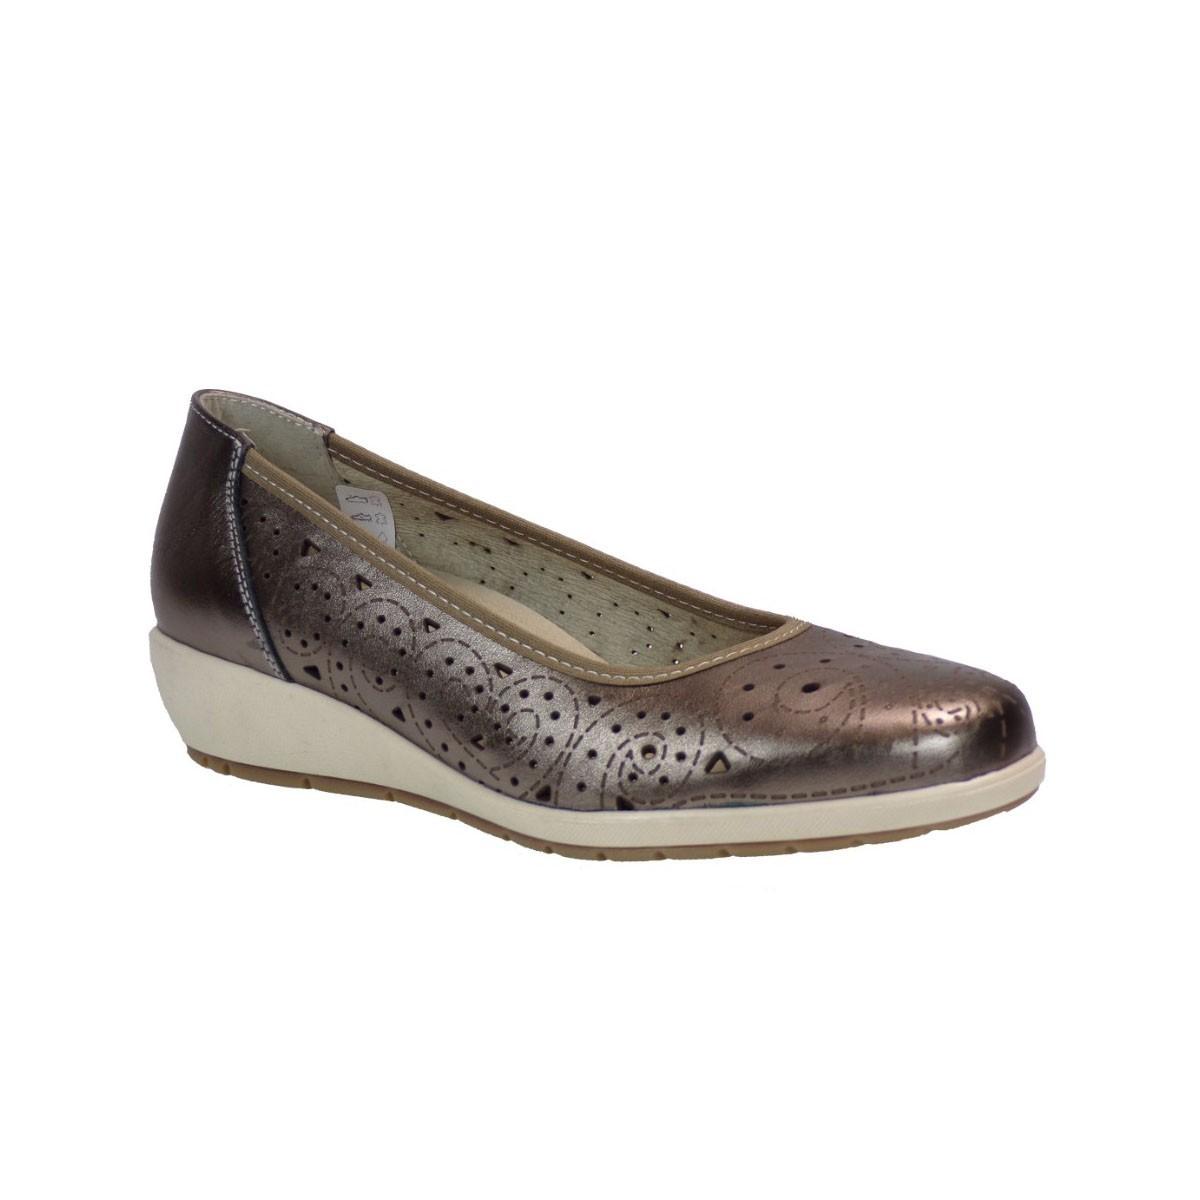 Kiarflex Γυναικεία Παπούτσια 17065.3 Μπρονζέ Kiarflex 17065,3 Μπρονζέ